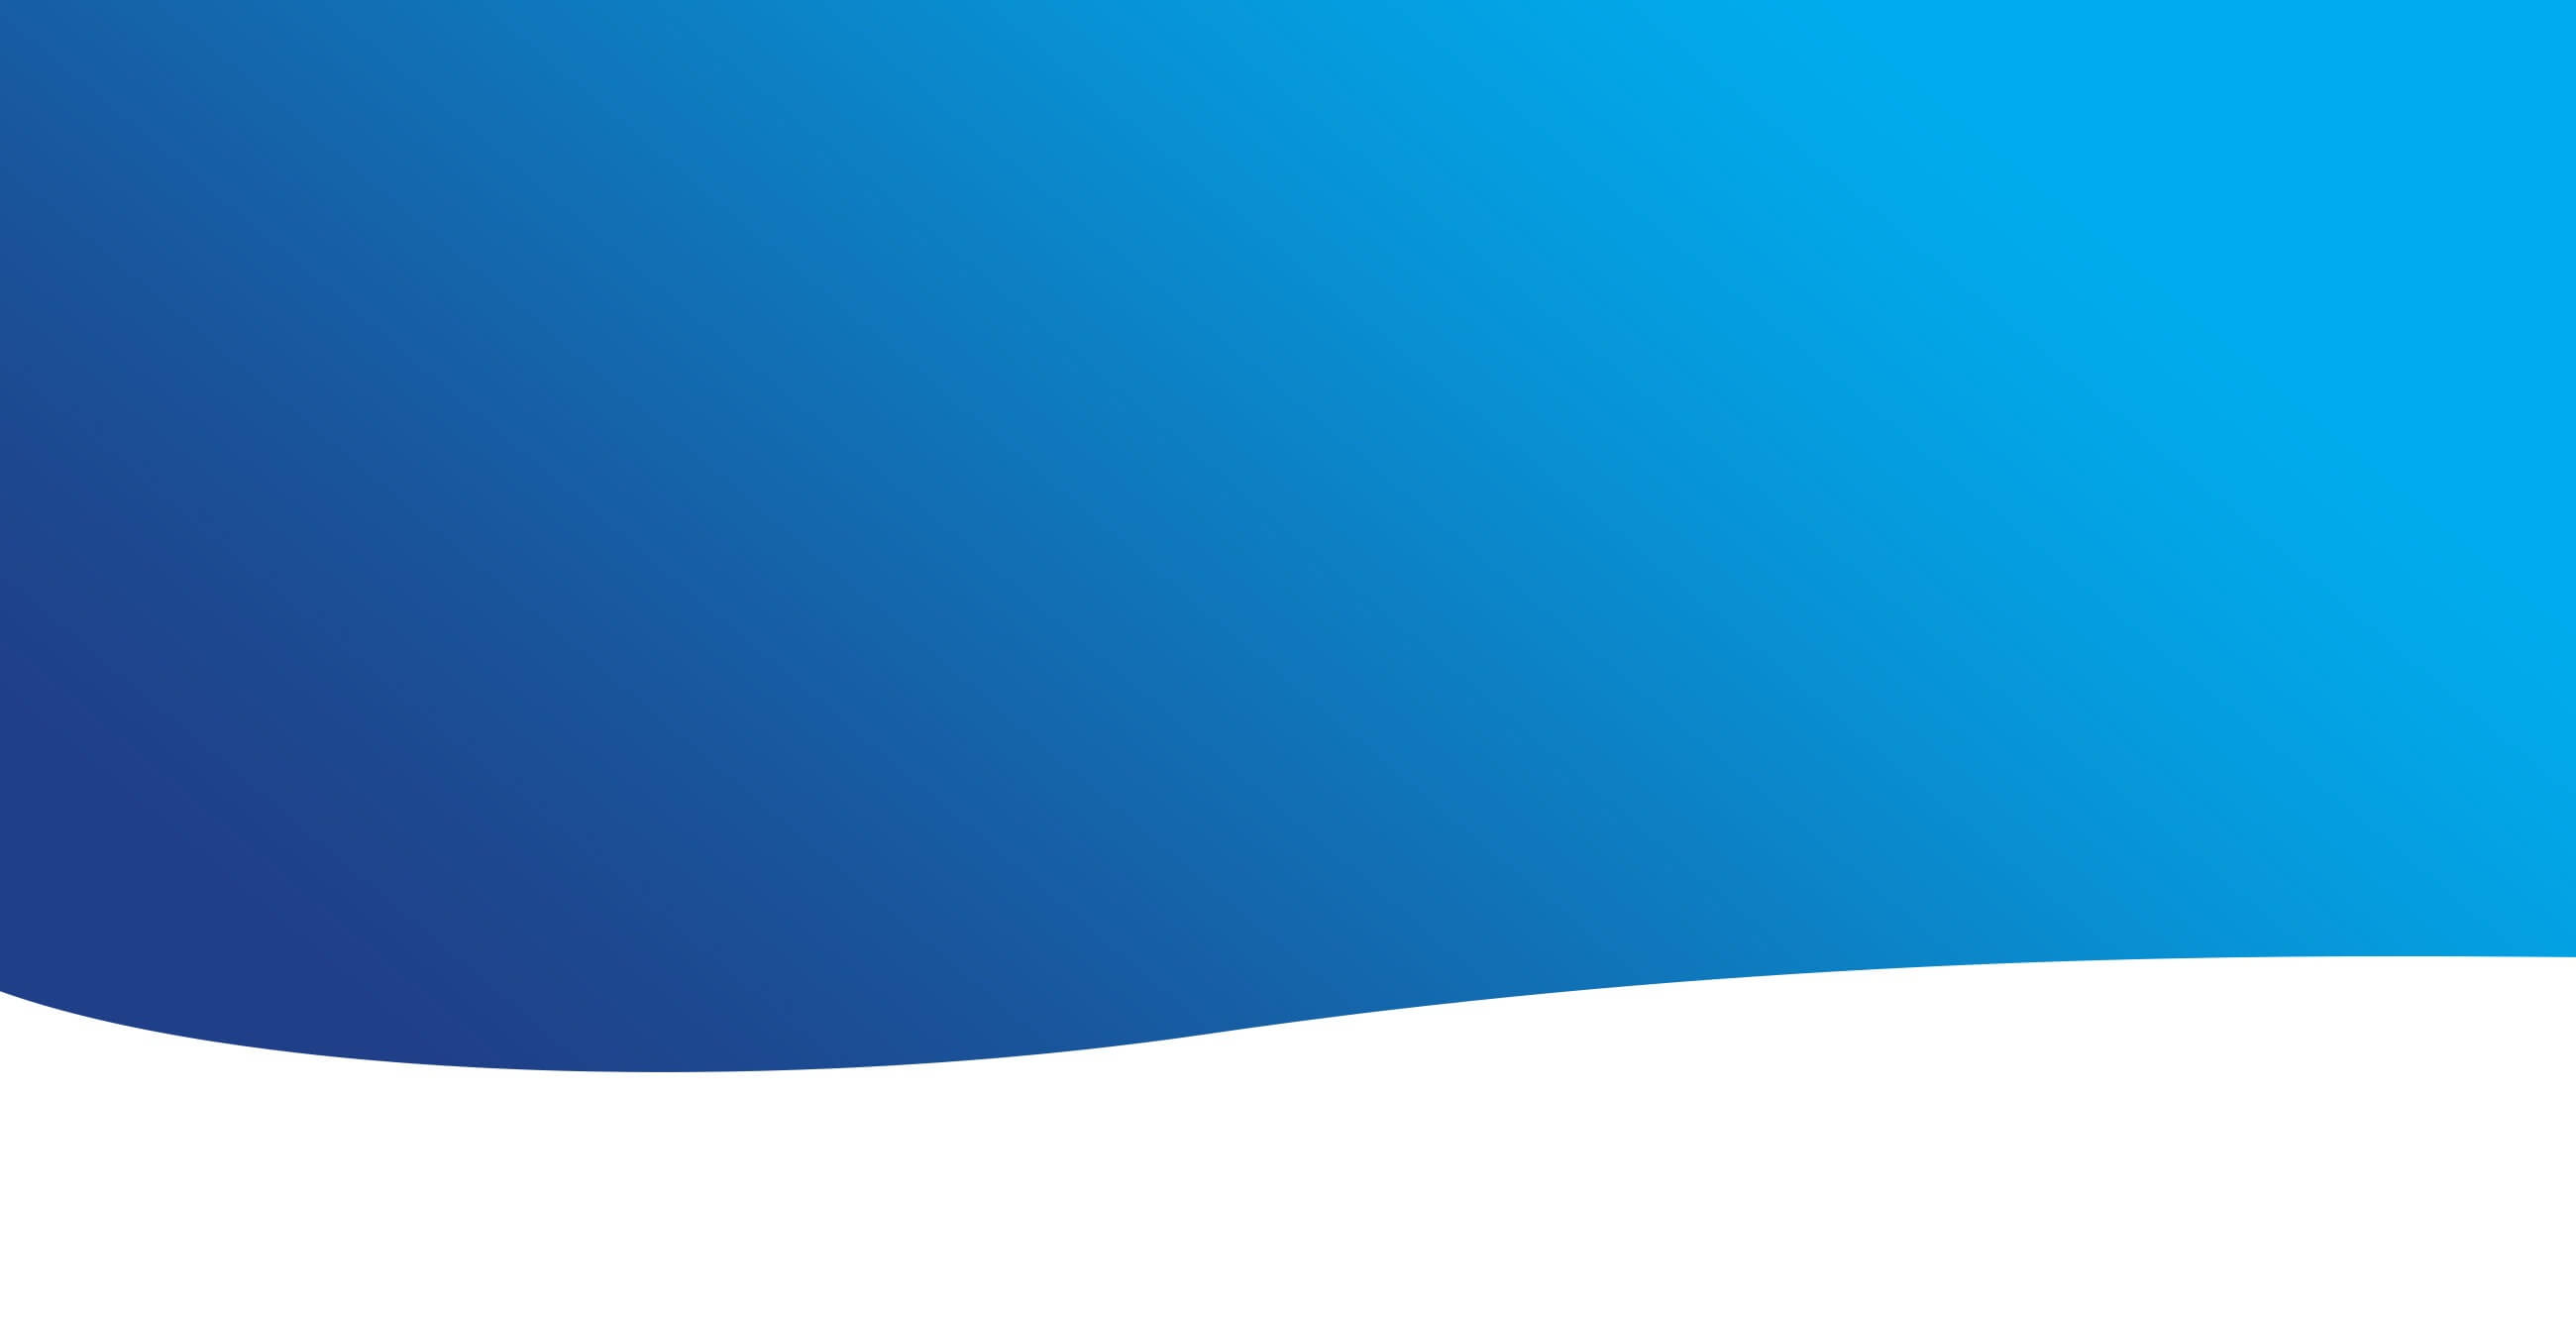 City Subaru - Blue Background